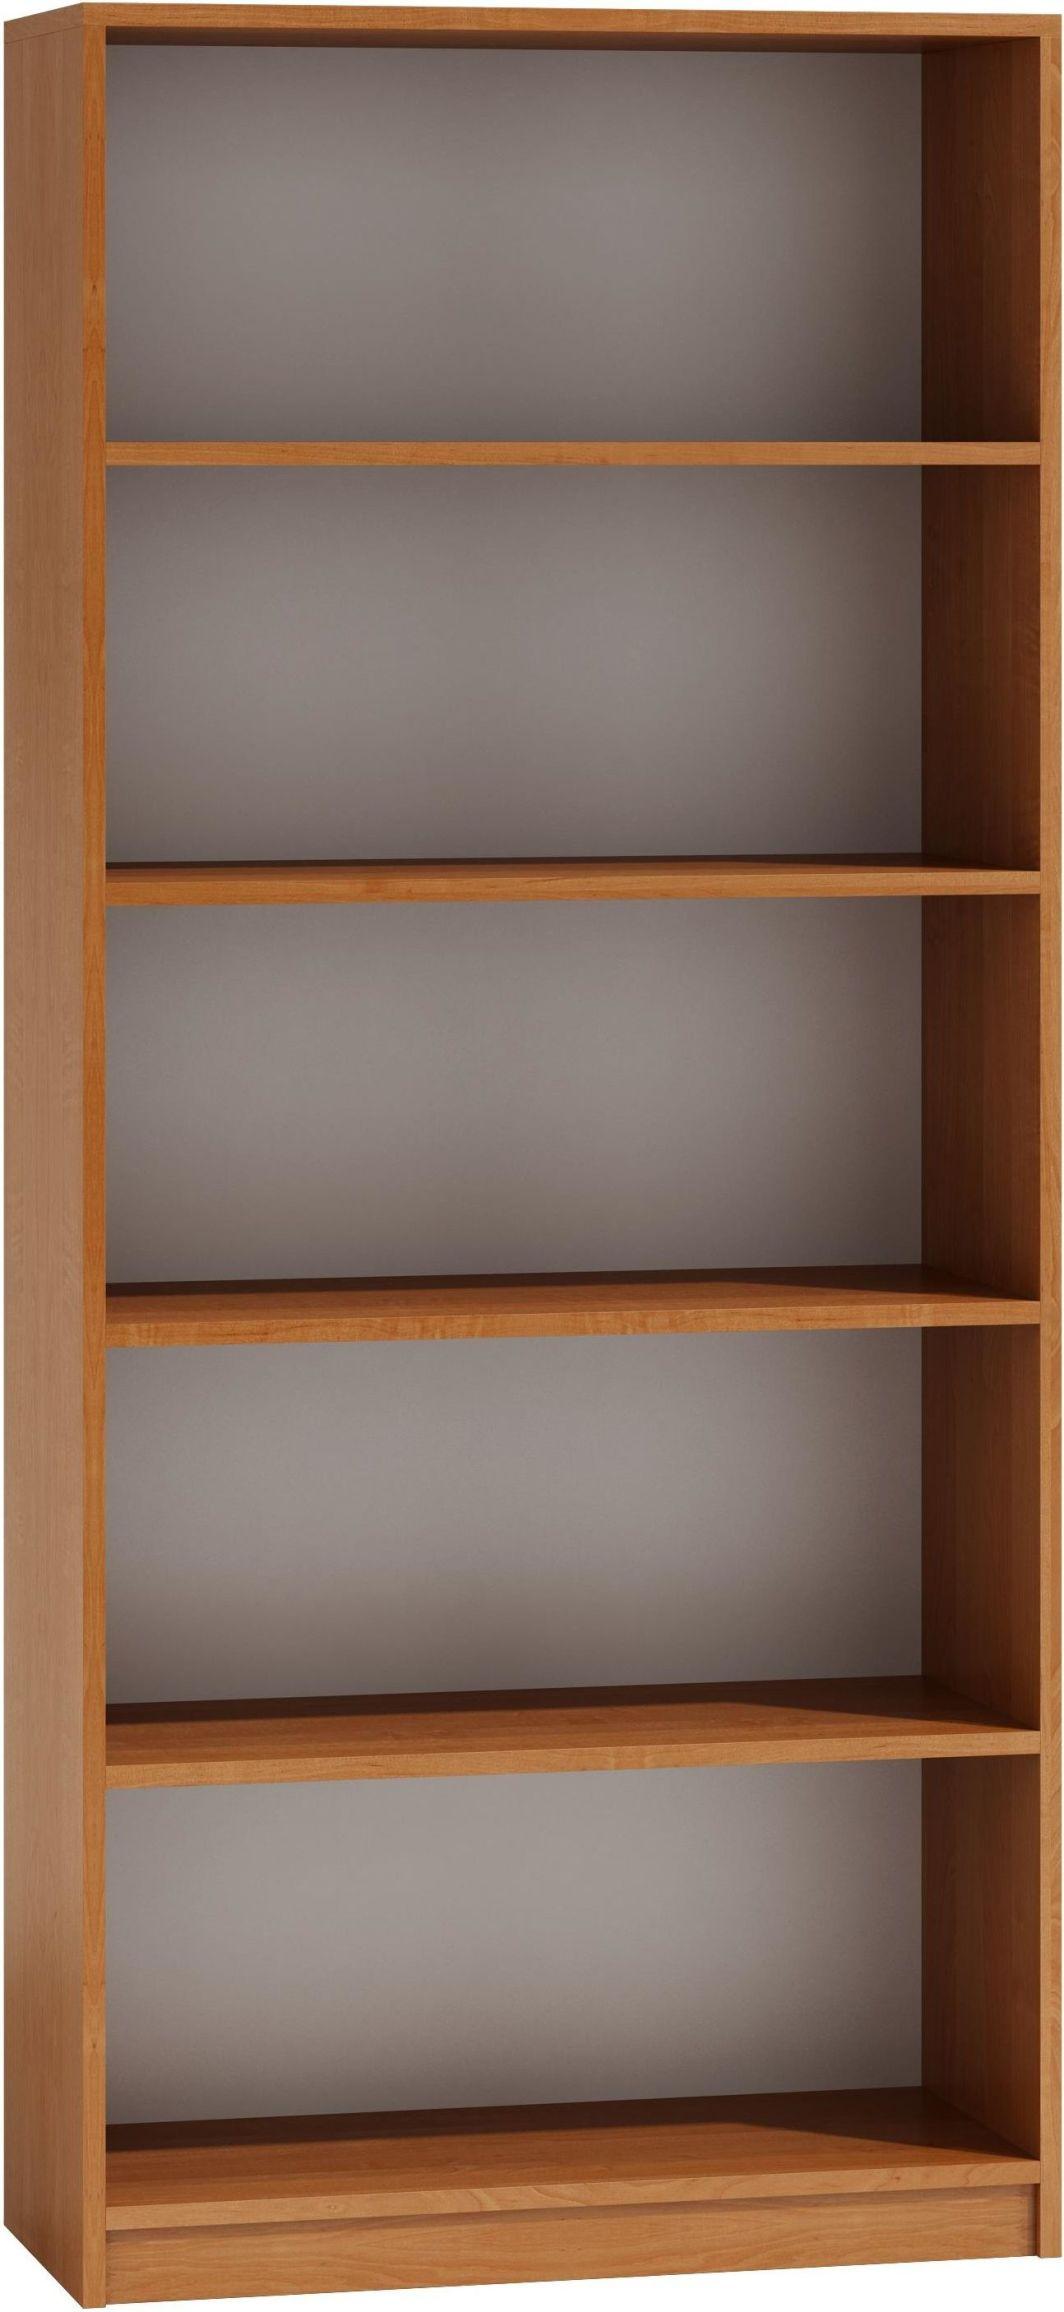 TopEshop Regał 80cm szafka książki segregatory r80 olcha 1